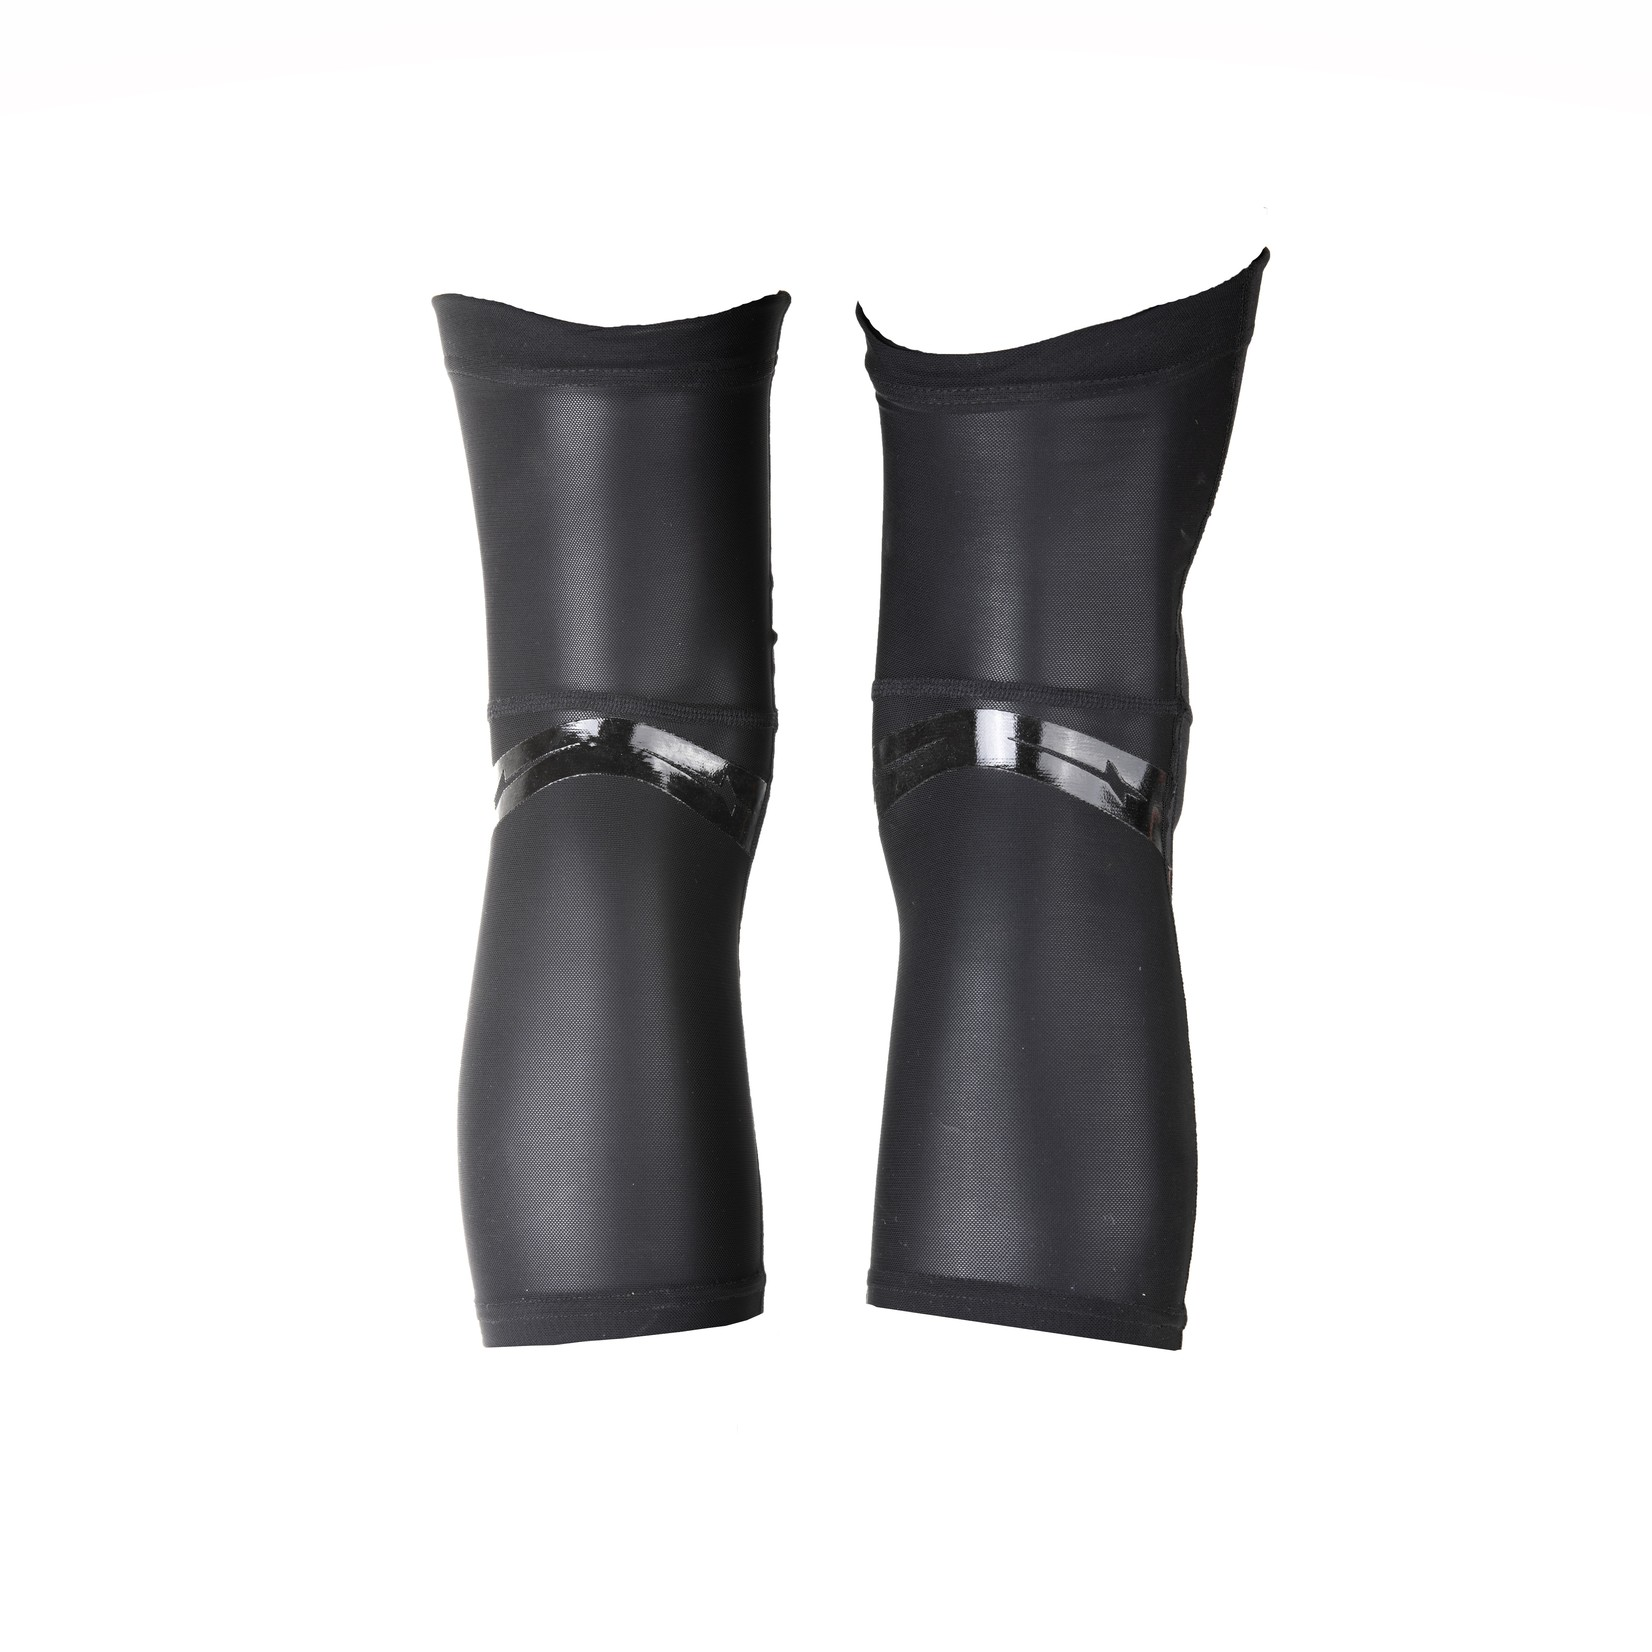 TROY LEE DESIGNS STAGE KNEE GUARD; BLACK XL/2X